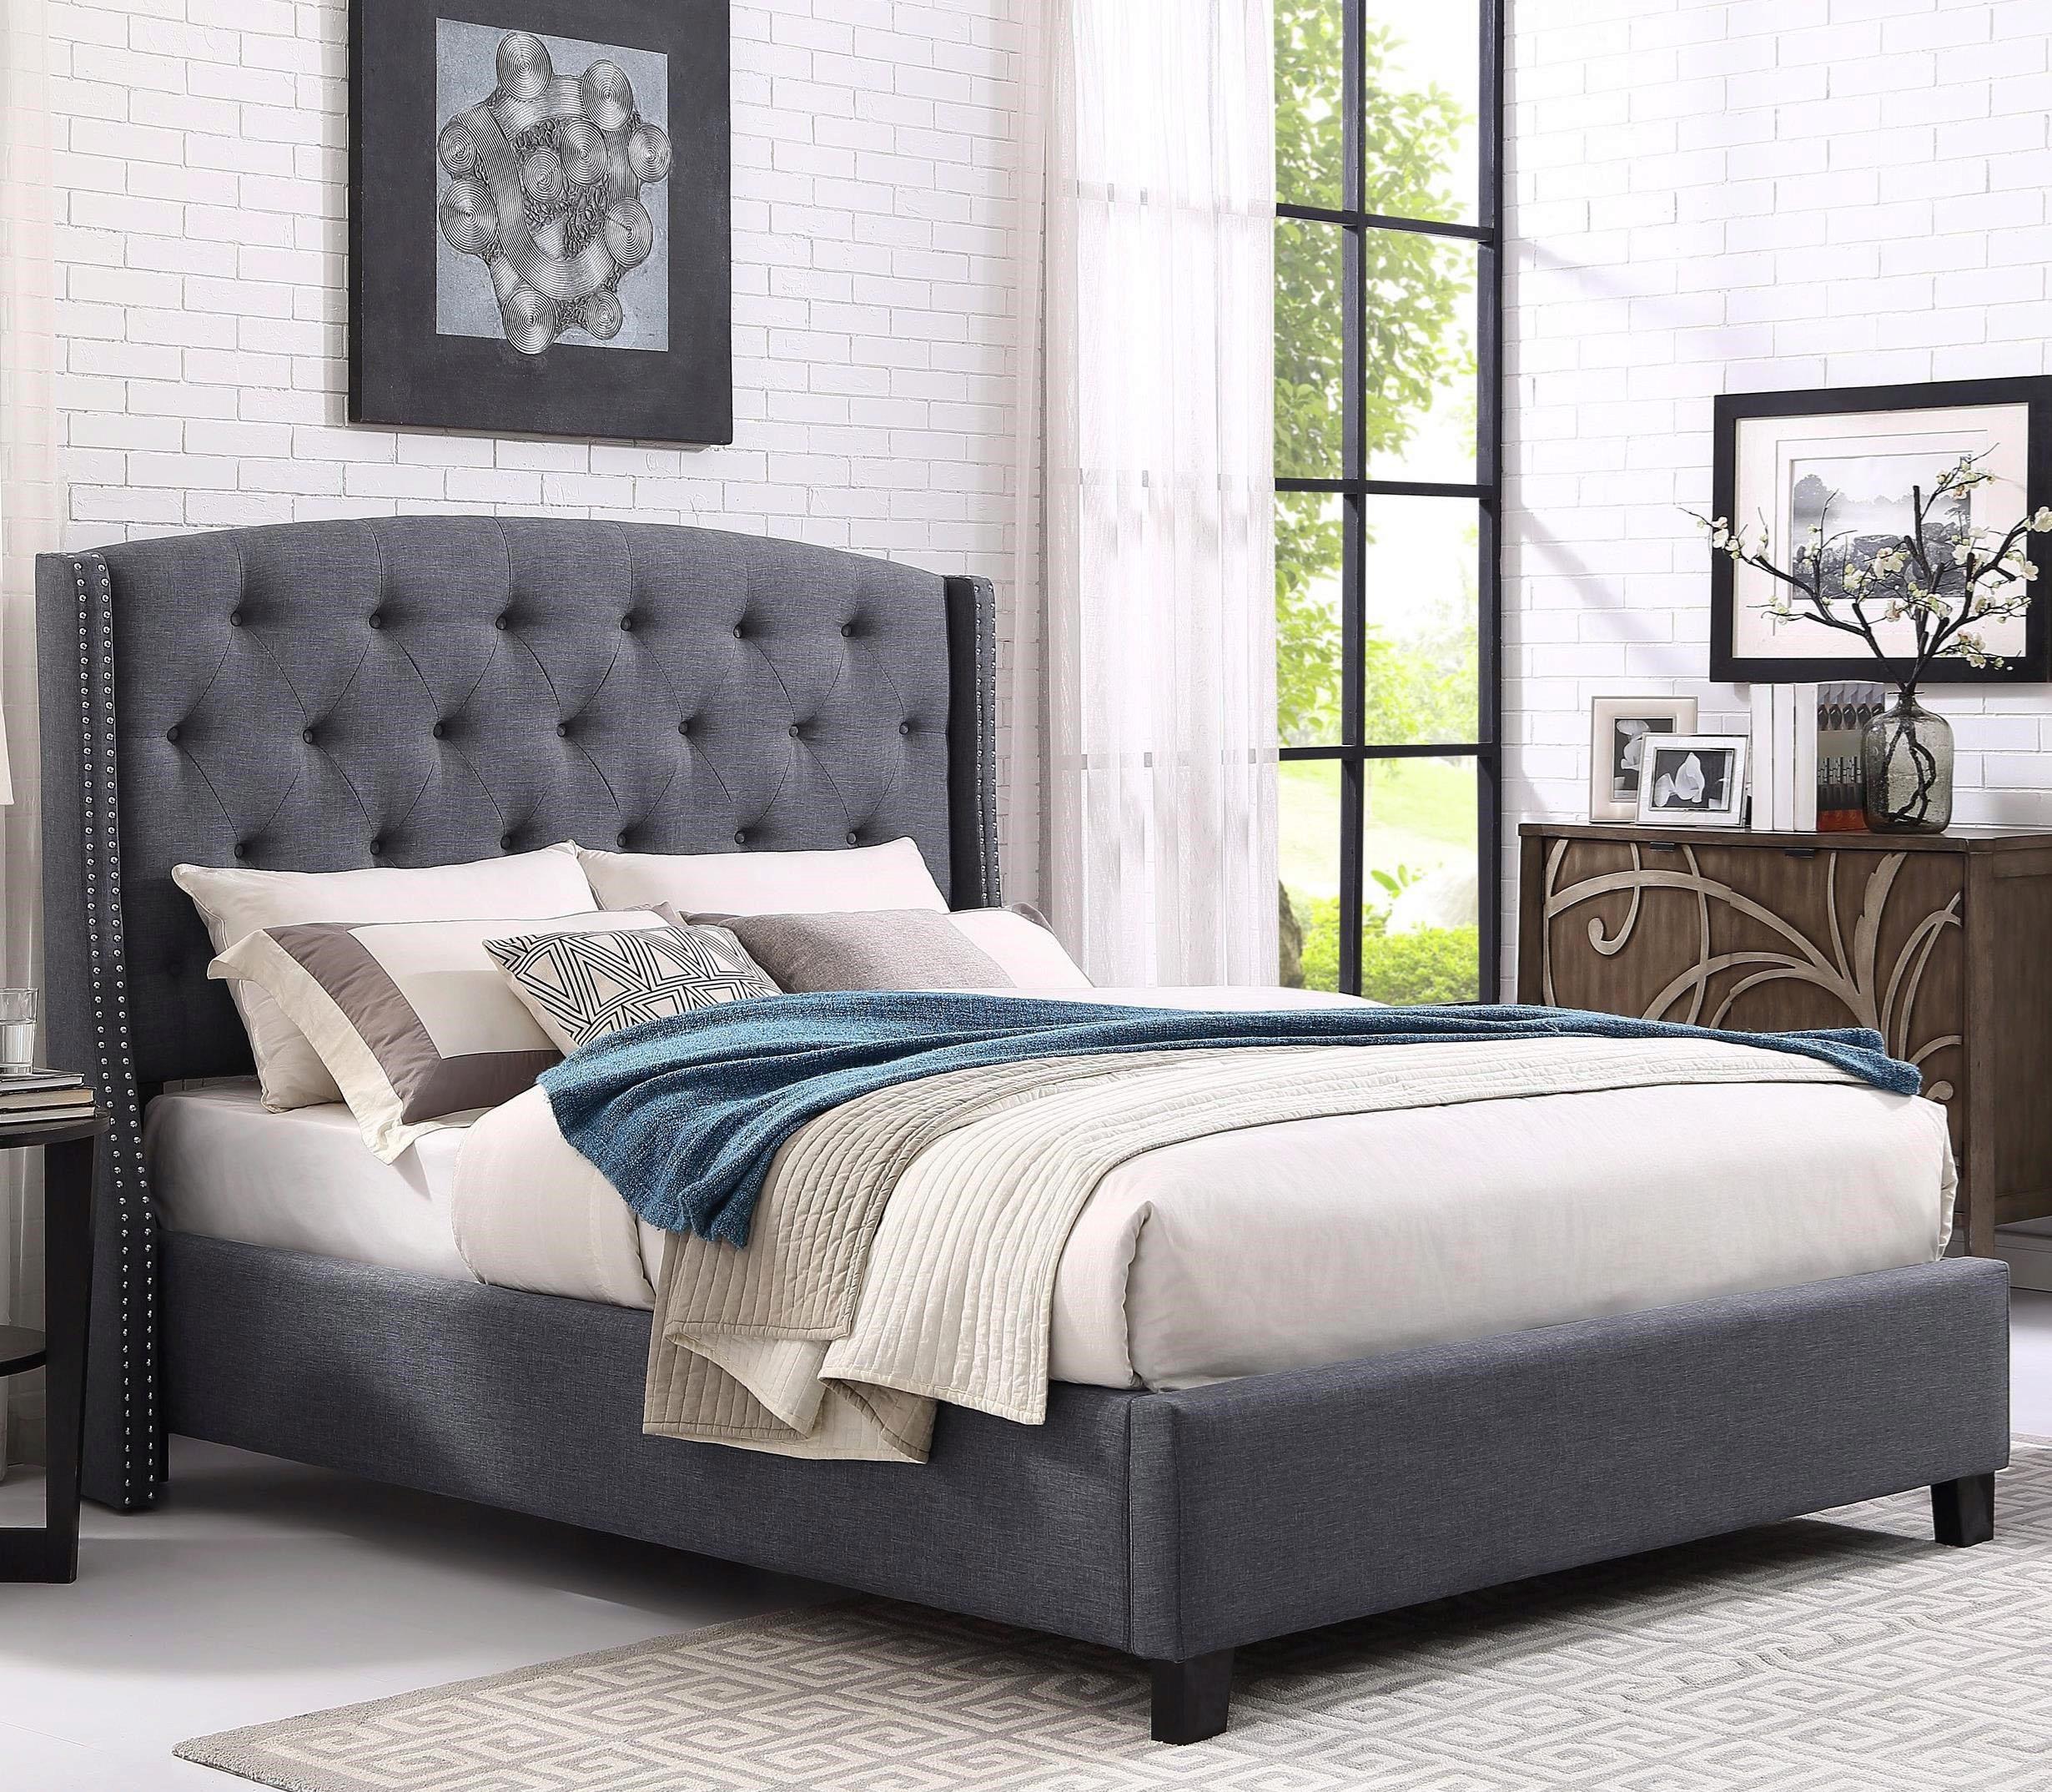 Crown Mark 5111 All Eva Grey Fabric Tufted Headboard King Size Bed 5111gy Ek Bed